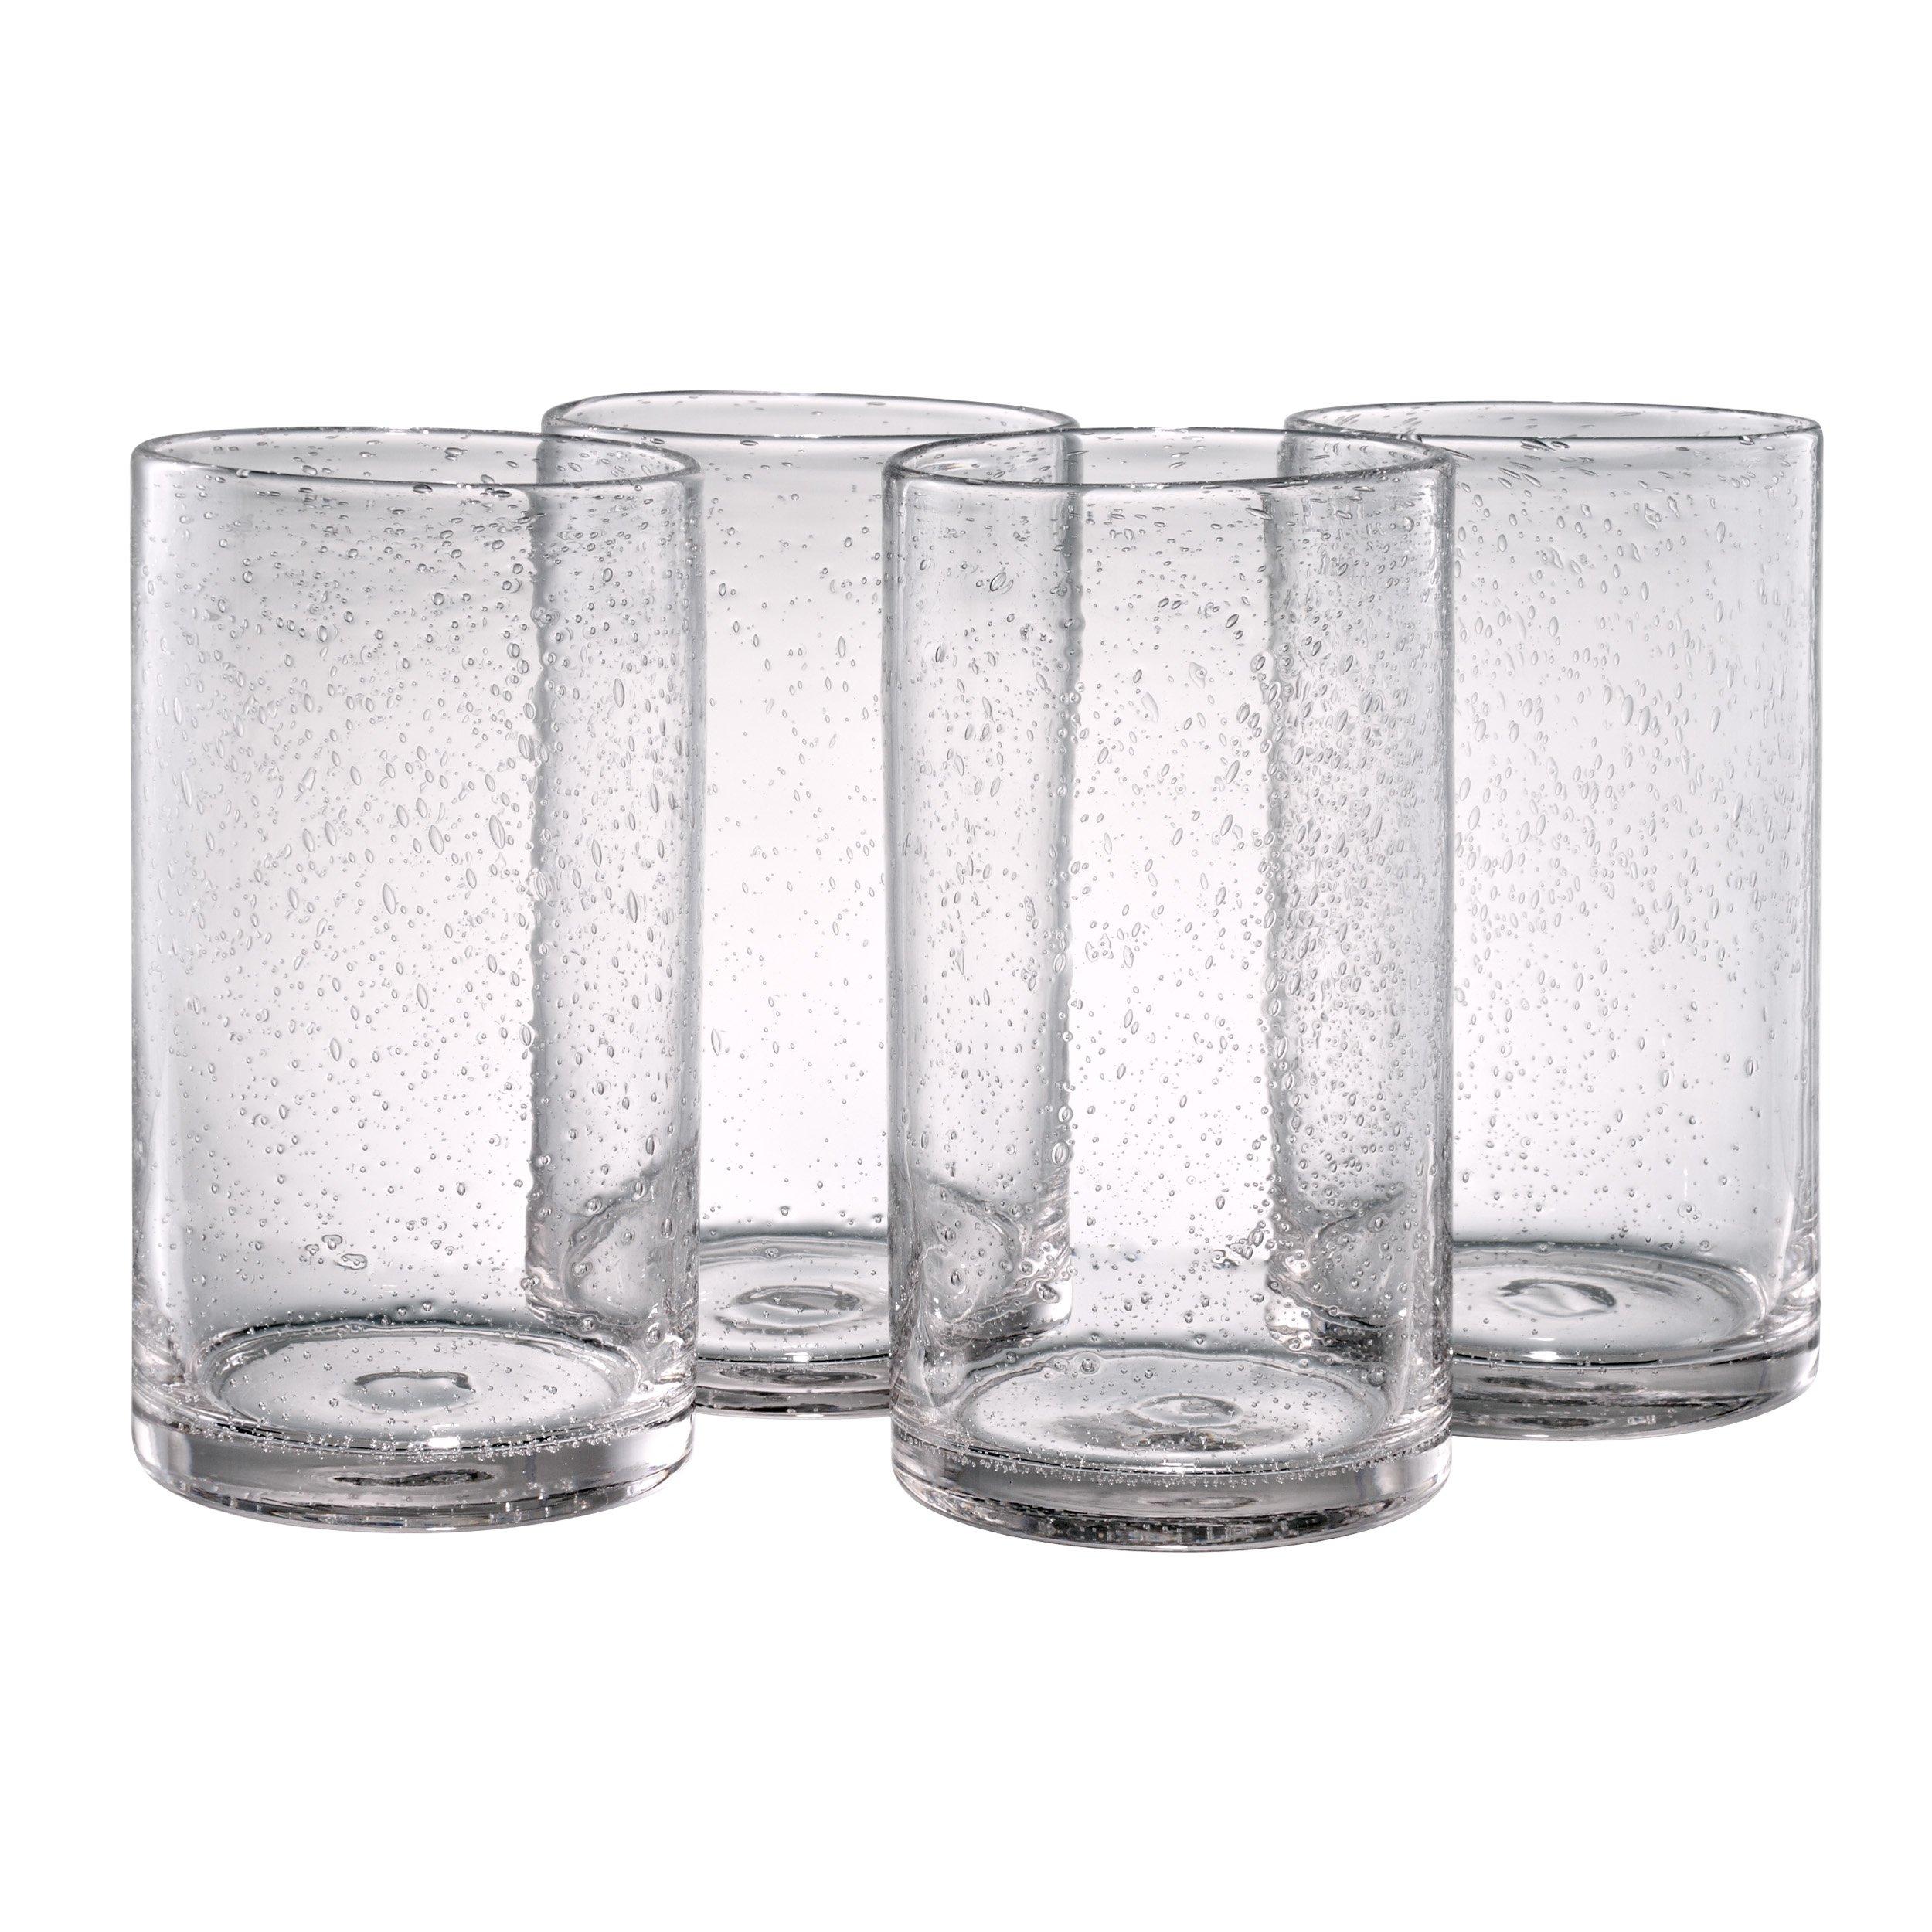 Artland Iris Highball Glasses, Clear, Set of 4